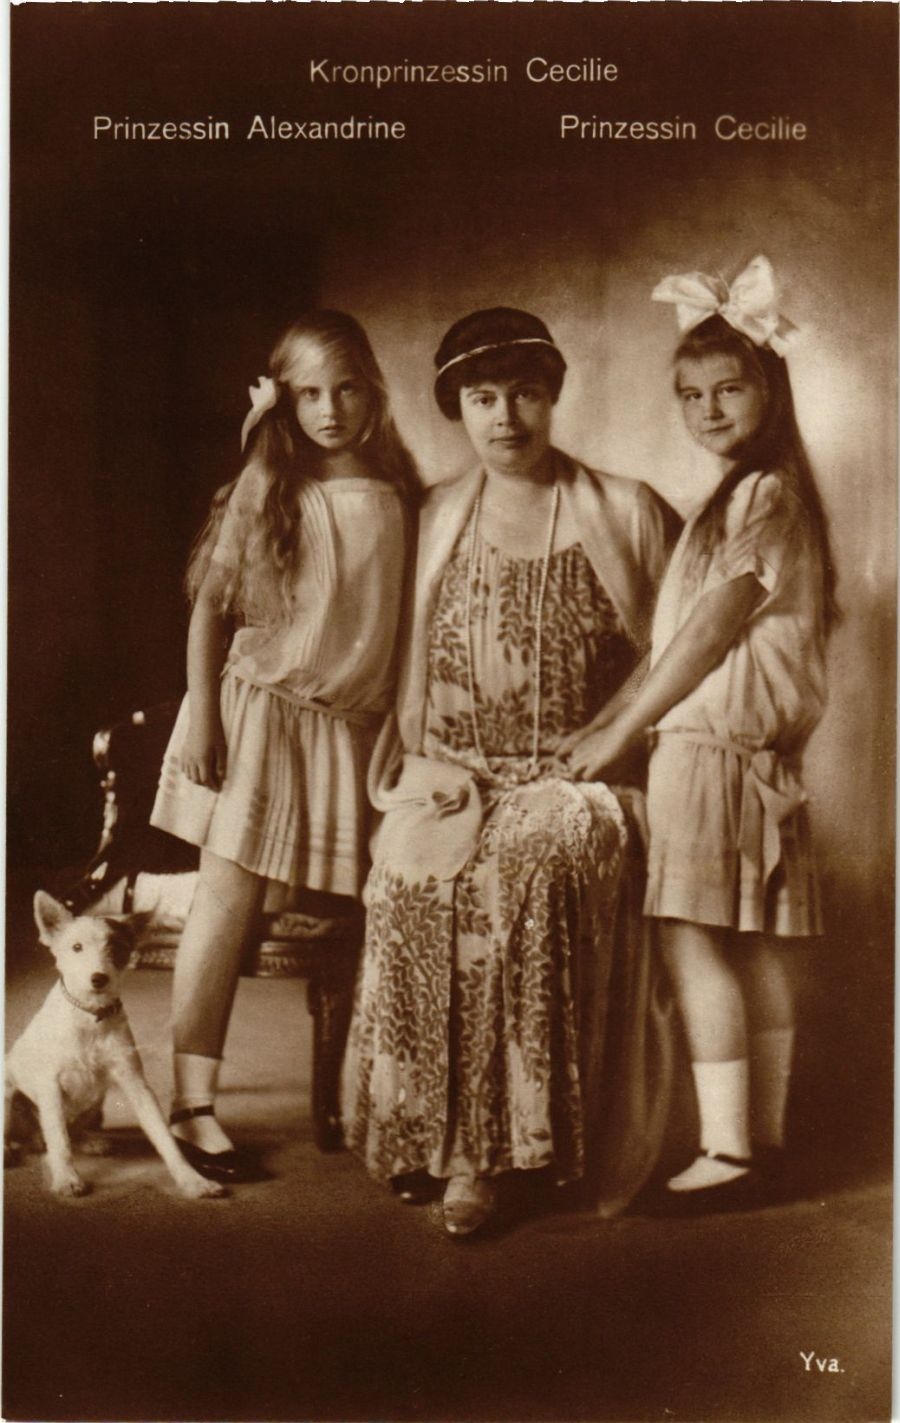 CPA-AK-Kronprinzessin-Cecilie-Alexandrine-Cecilie-GERMAN-ROYALTY-867432